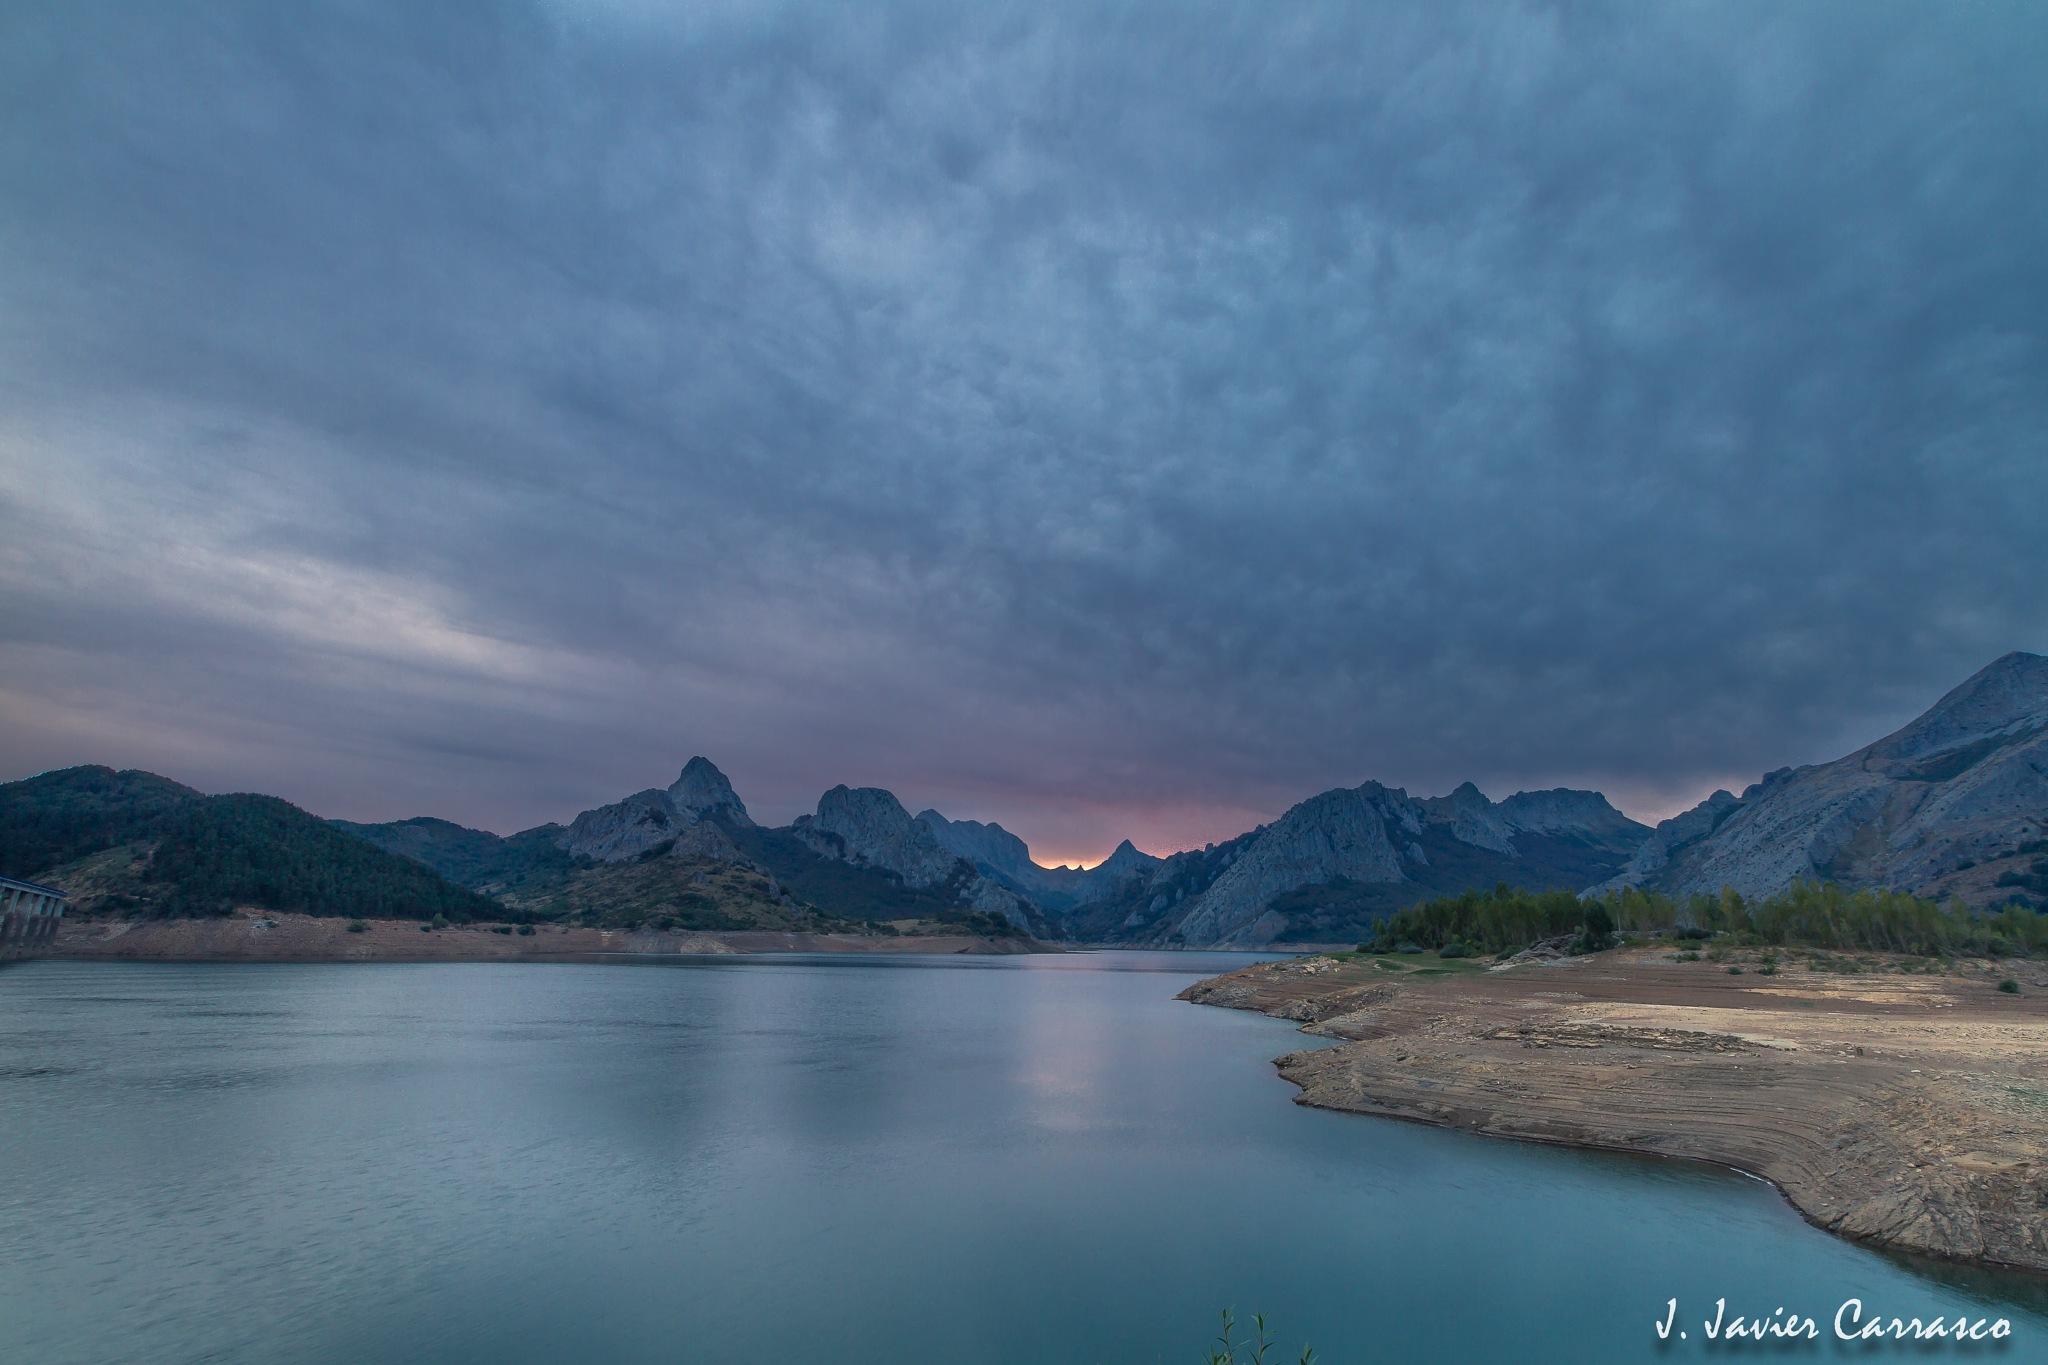 In the reservoir by J Javier Carrasco